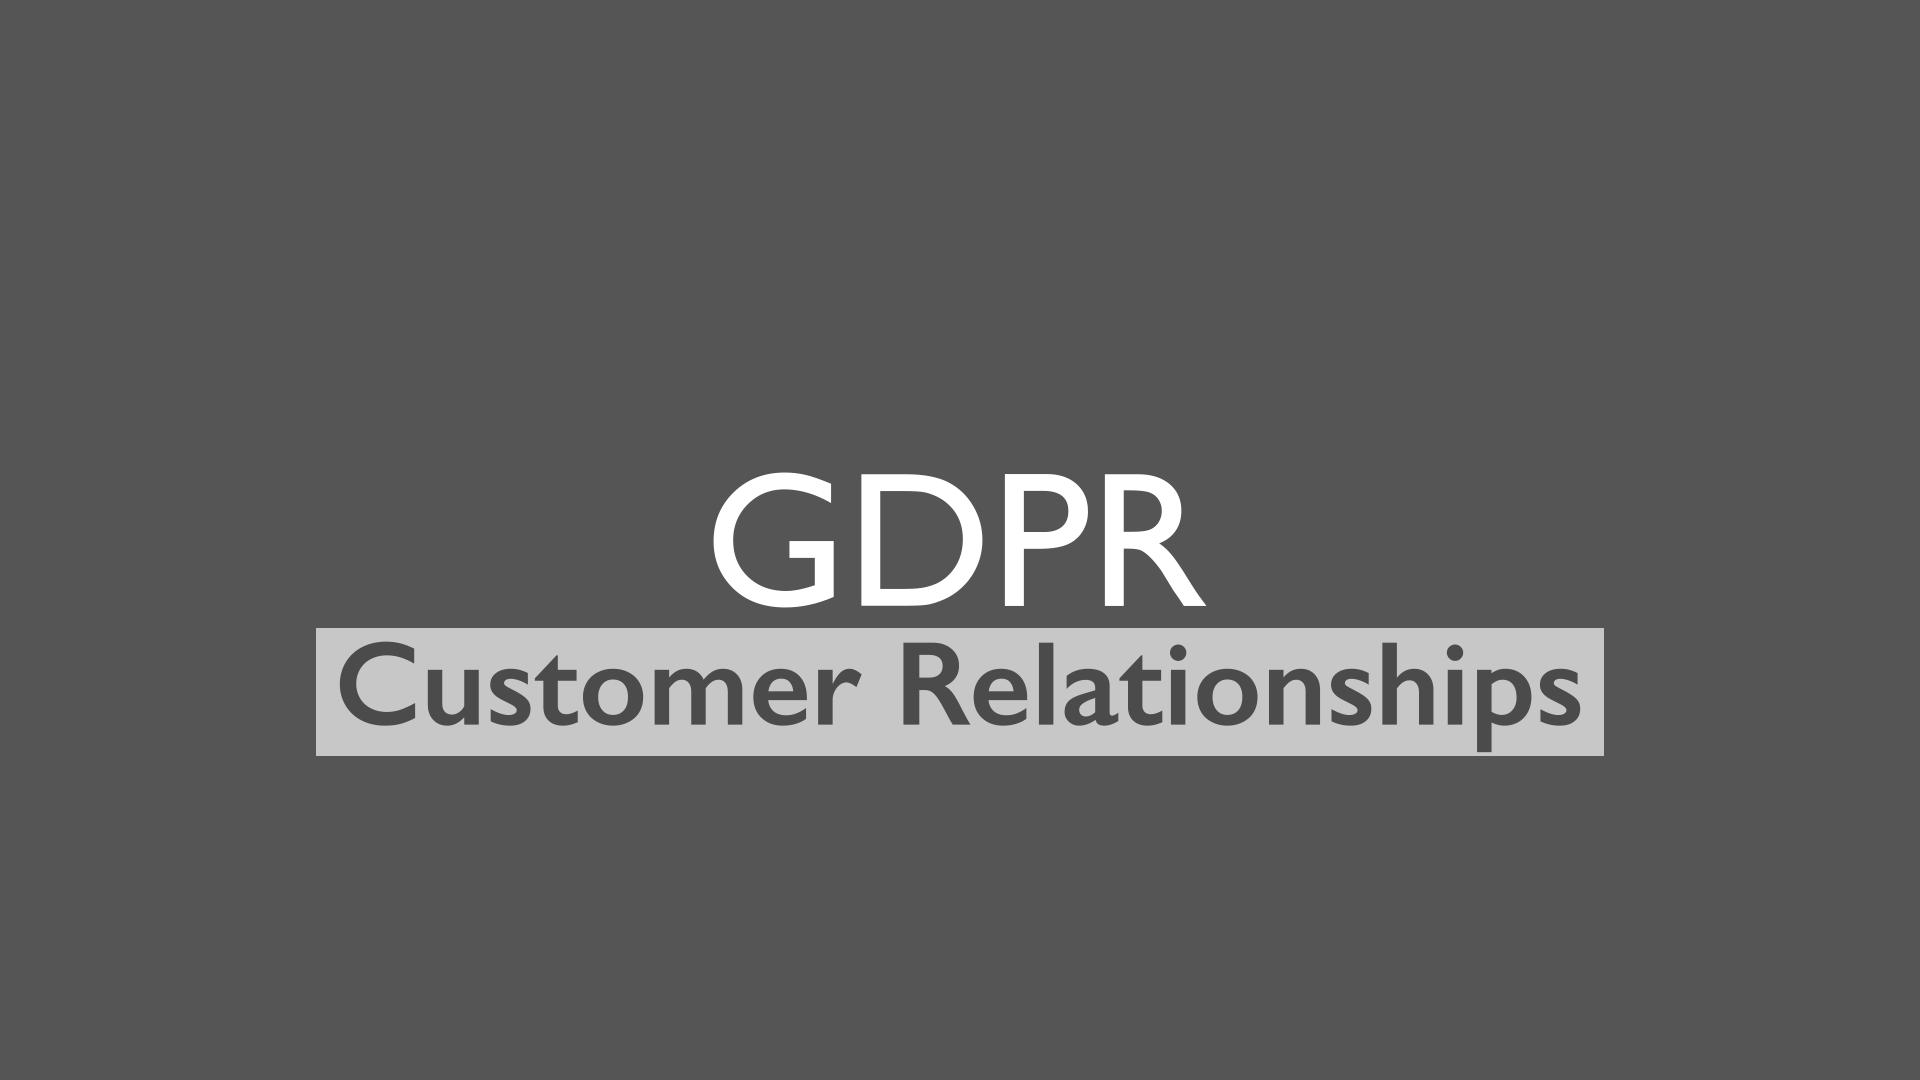 GDPR Animation